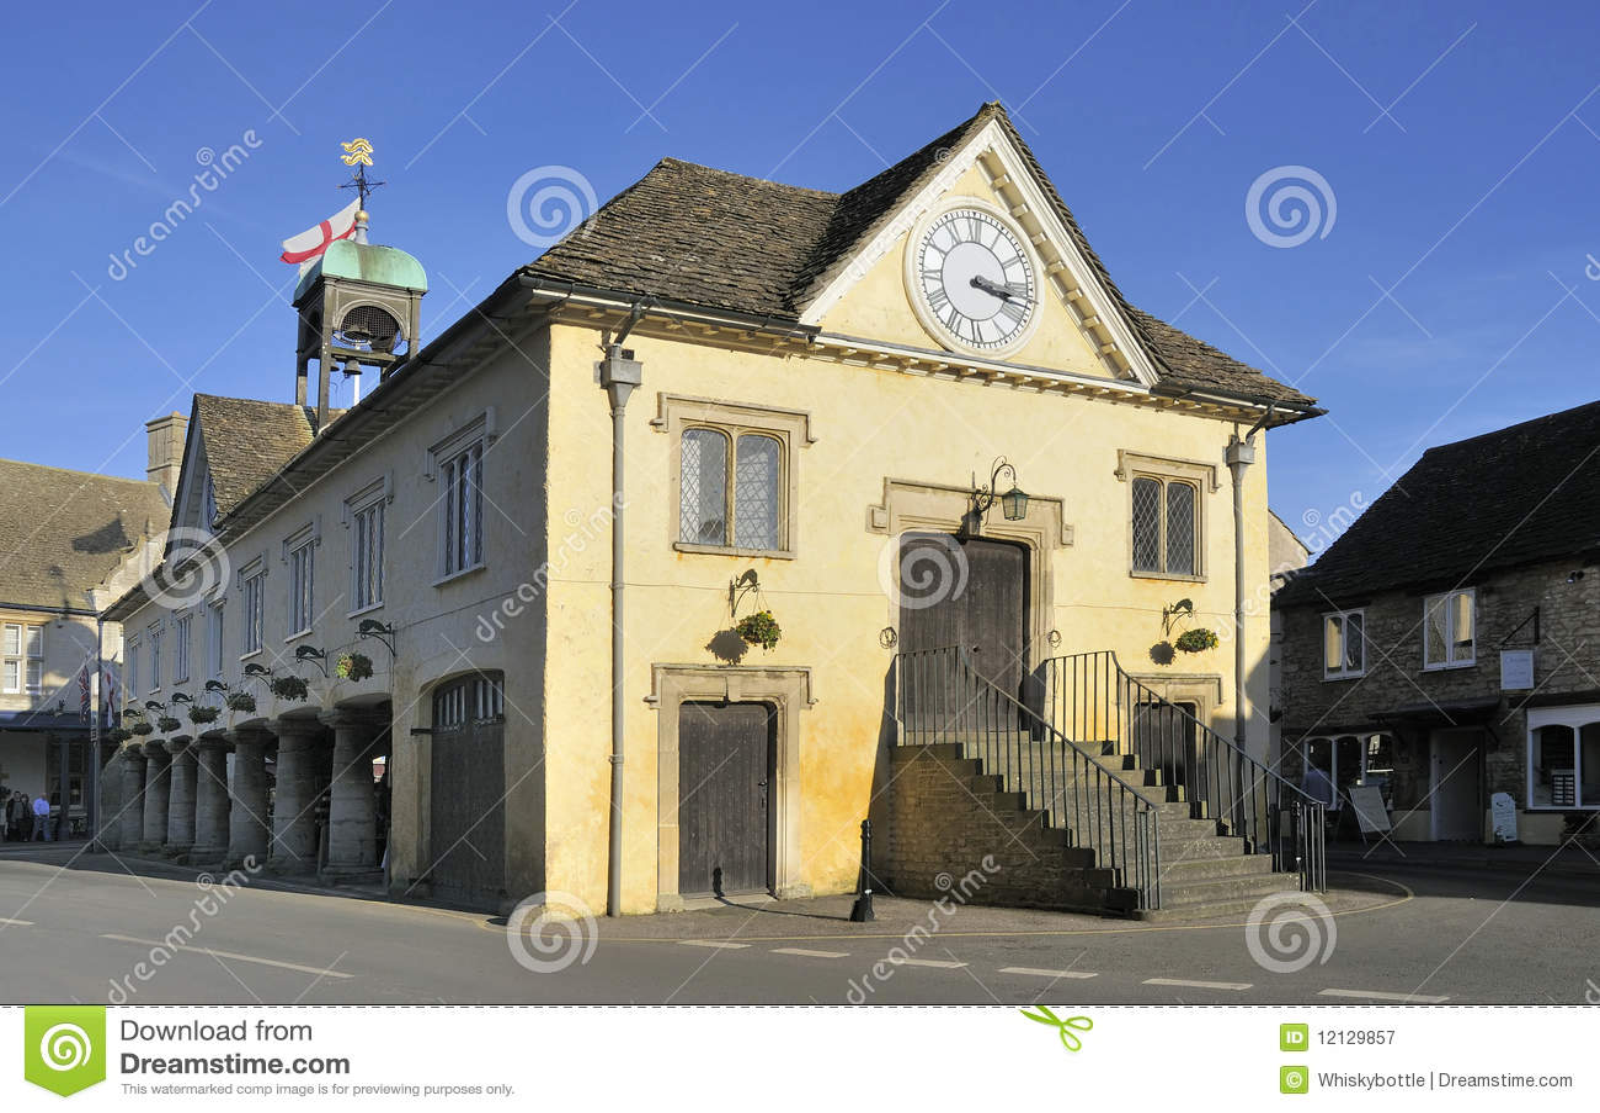 Tetbury Rathaus